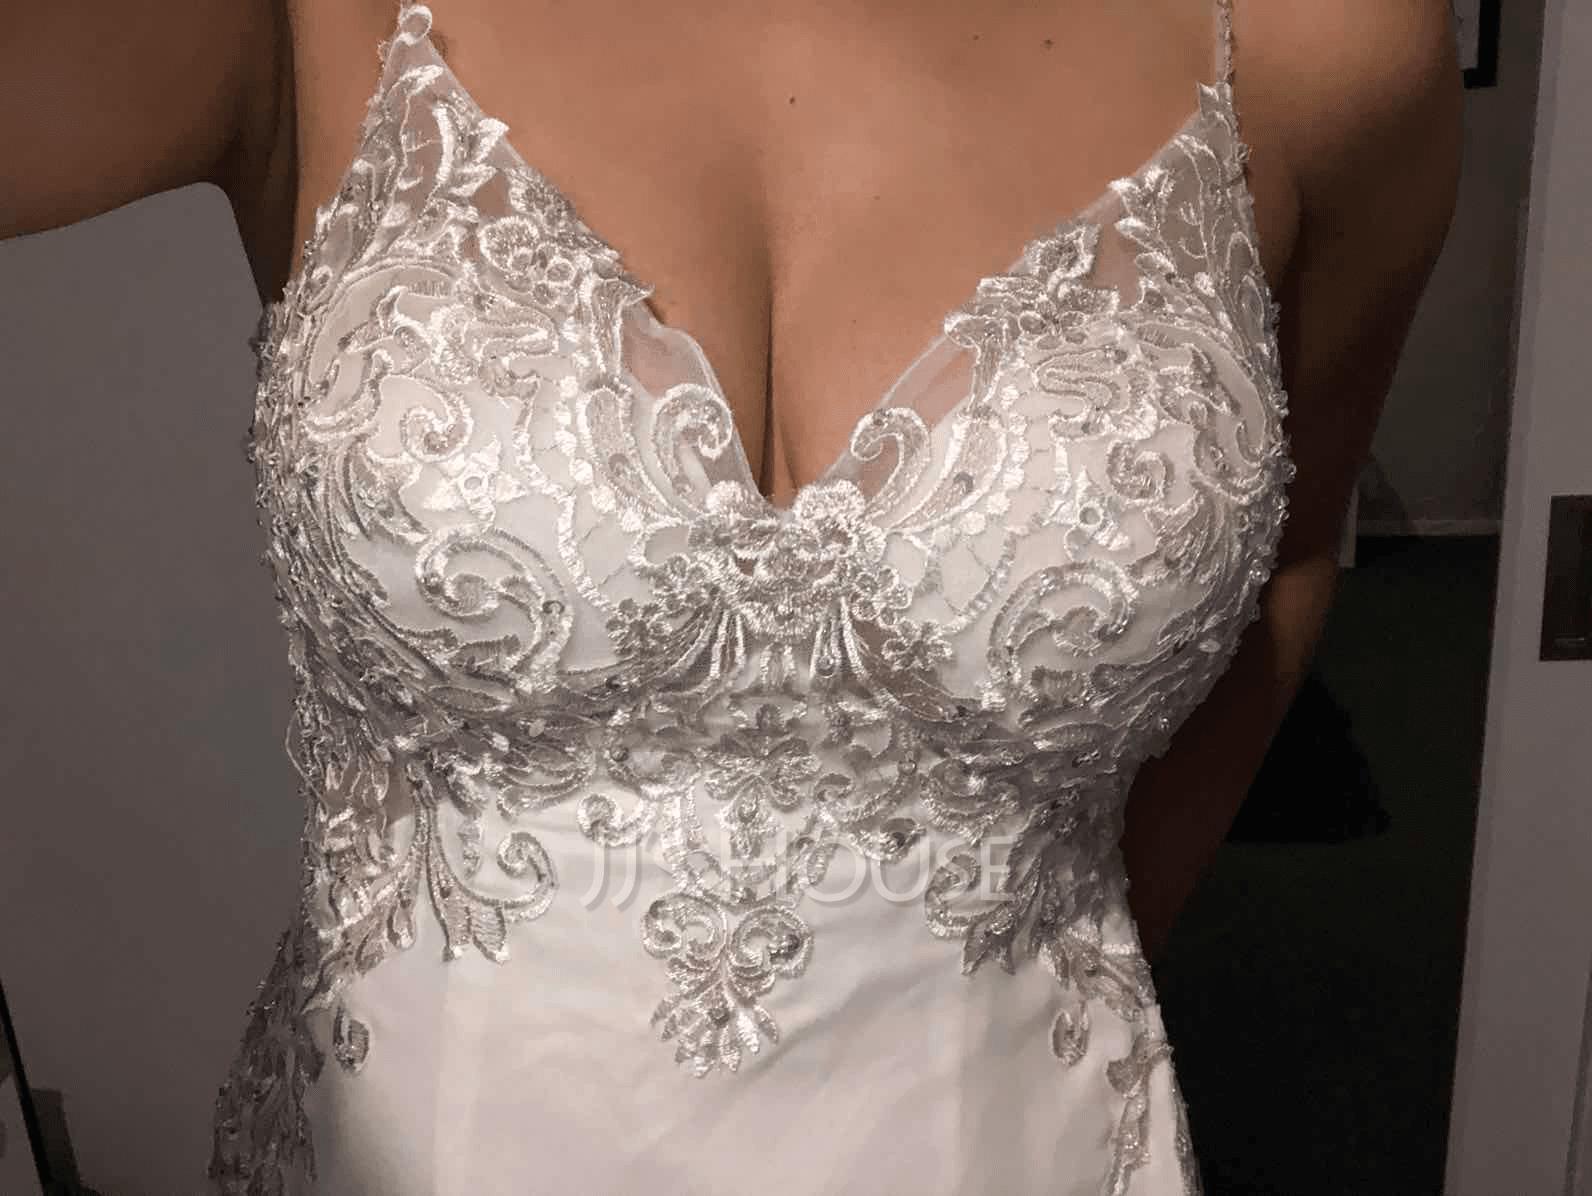 Corte trompeta/sirena Escote en V Barrer/Cepillo tren Gasa Encaje Vestido de novia con Lentejuelas